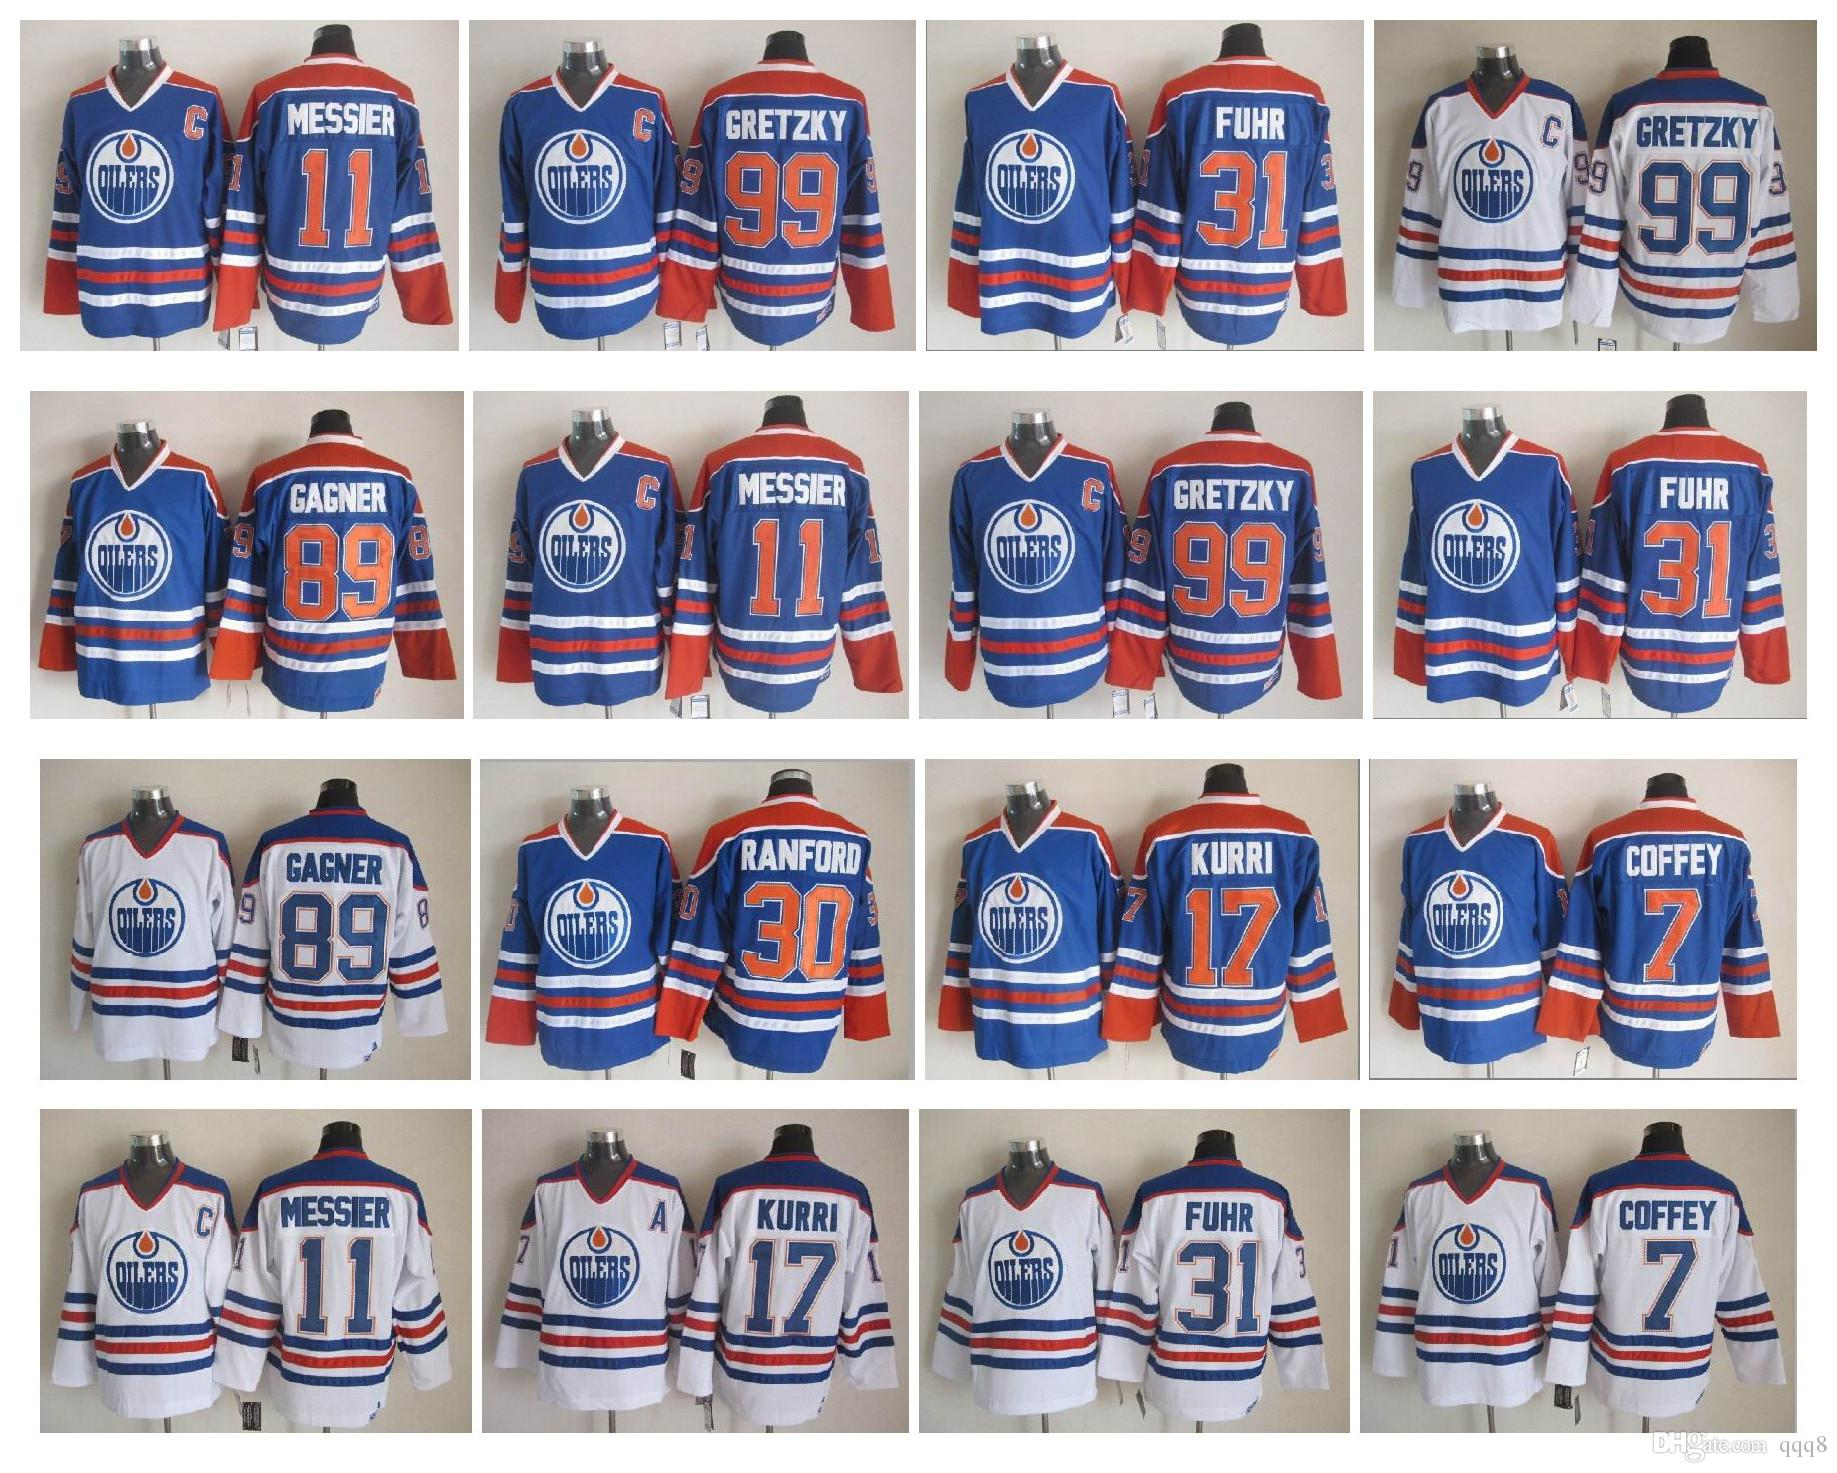 Vintage Edmonton Oilers Jersey 99 Wayne Gretzky 11 Mark Messier 31 Grant Fuhr 7 Paul Coffey 17 Jari Kurri 89 Sam Gagner Ranford Retro Hockey